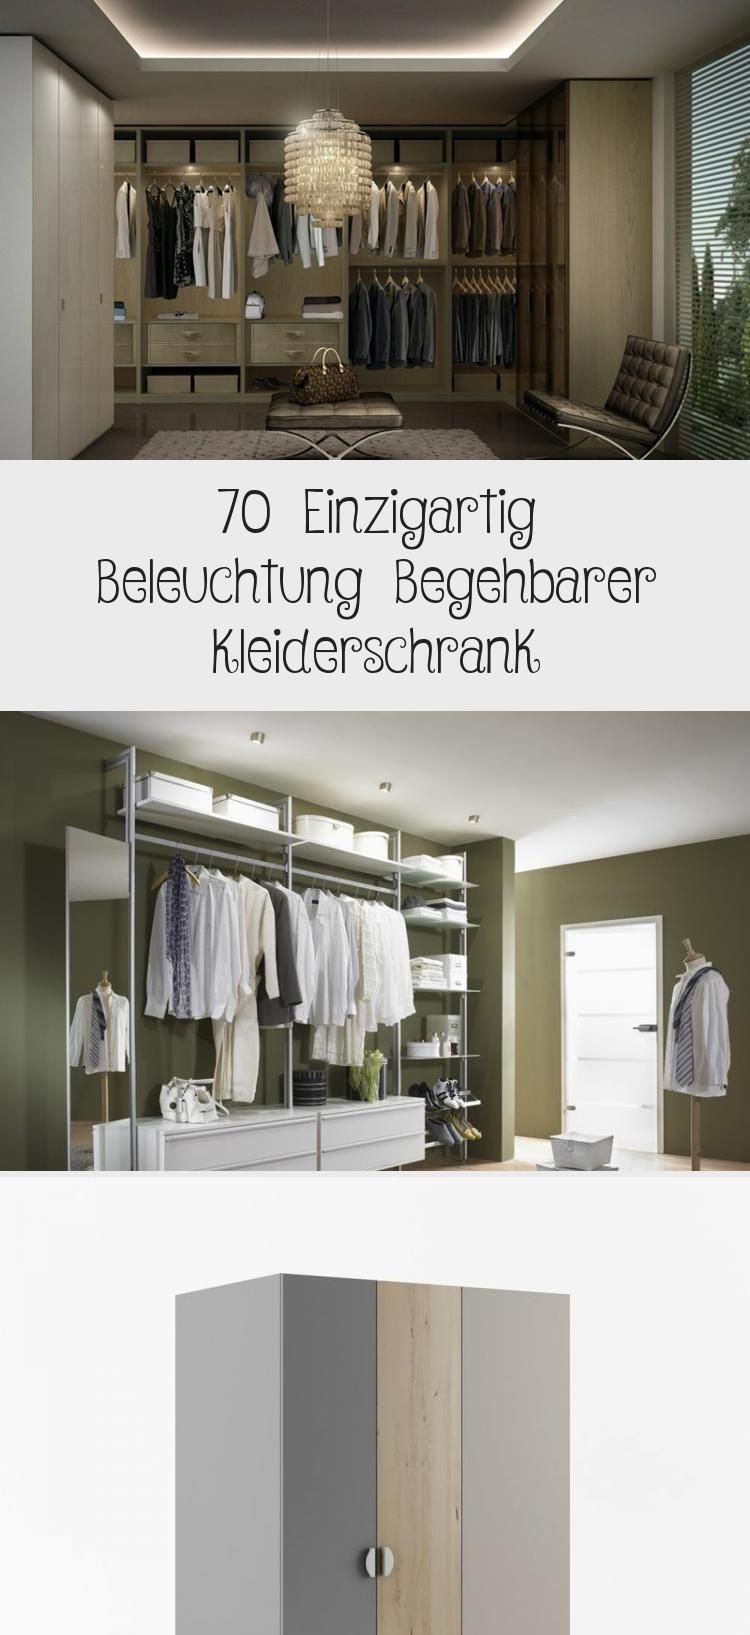 70 Einzigartig Beleuchtung Begehbarer Kleiderschrank Begehbarer Kleiderschrank Begehbarer Kleiderschrank Dachschrage Kleiderschrank Fur Dachschrage